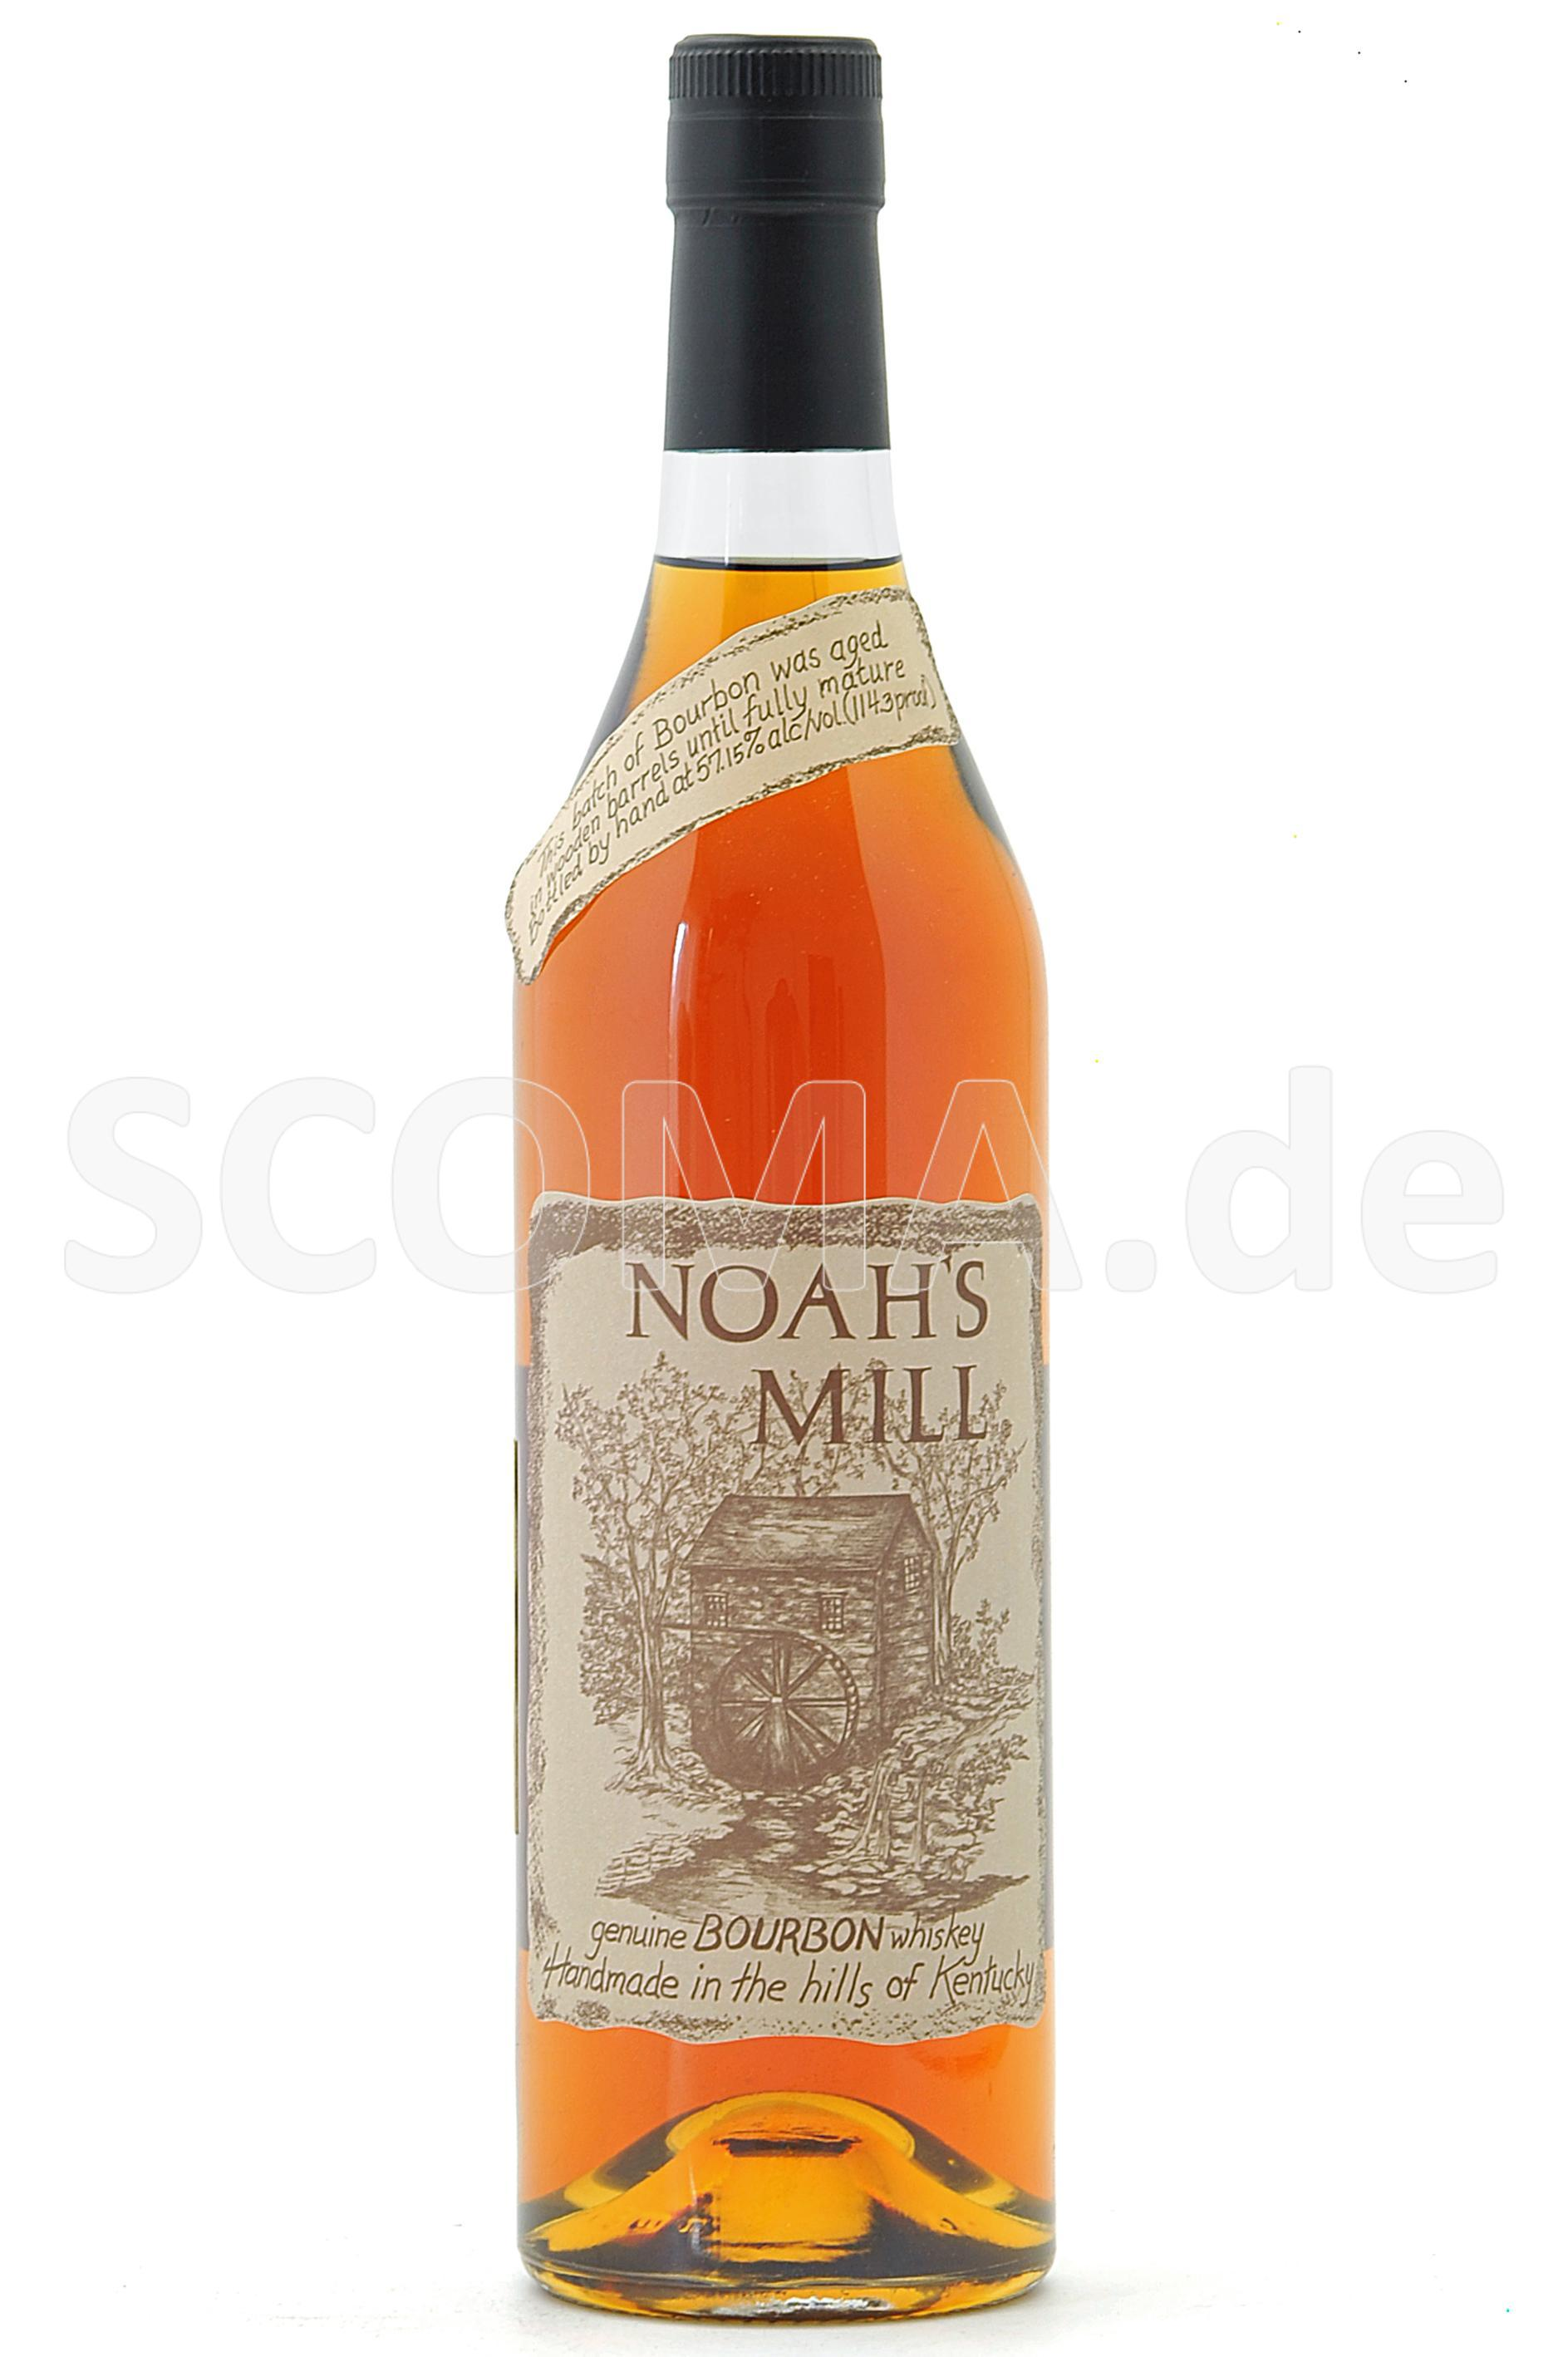 Noah's Mill Bourbon Whiskey